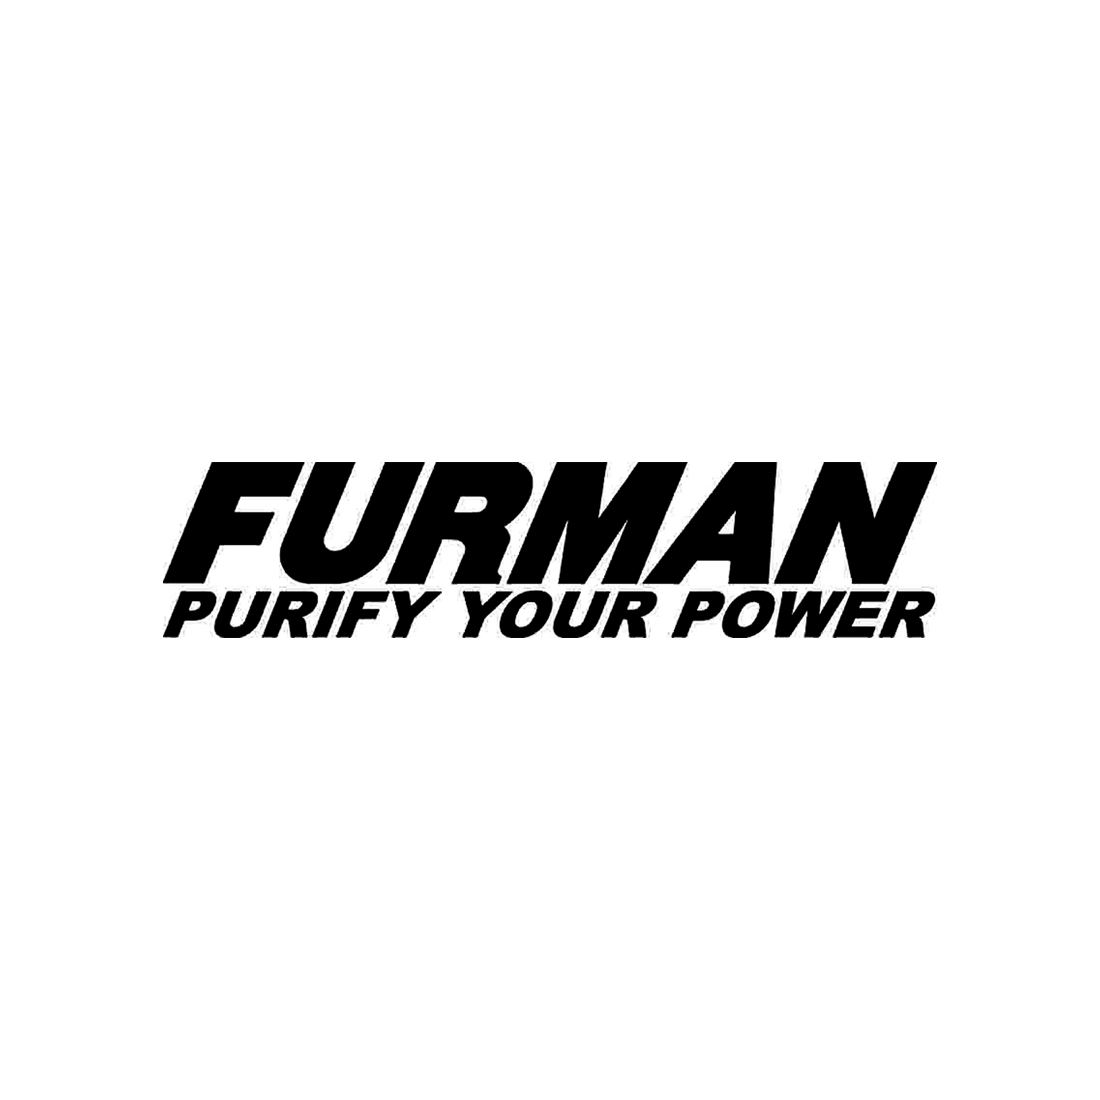 Furman Power